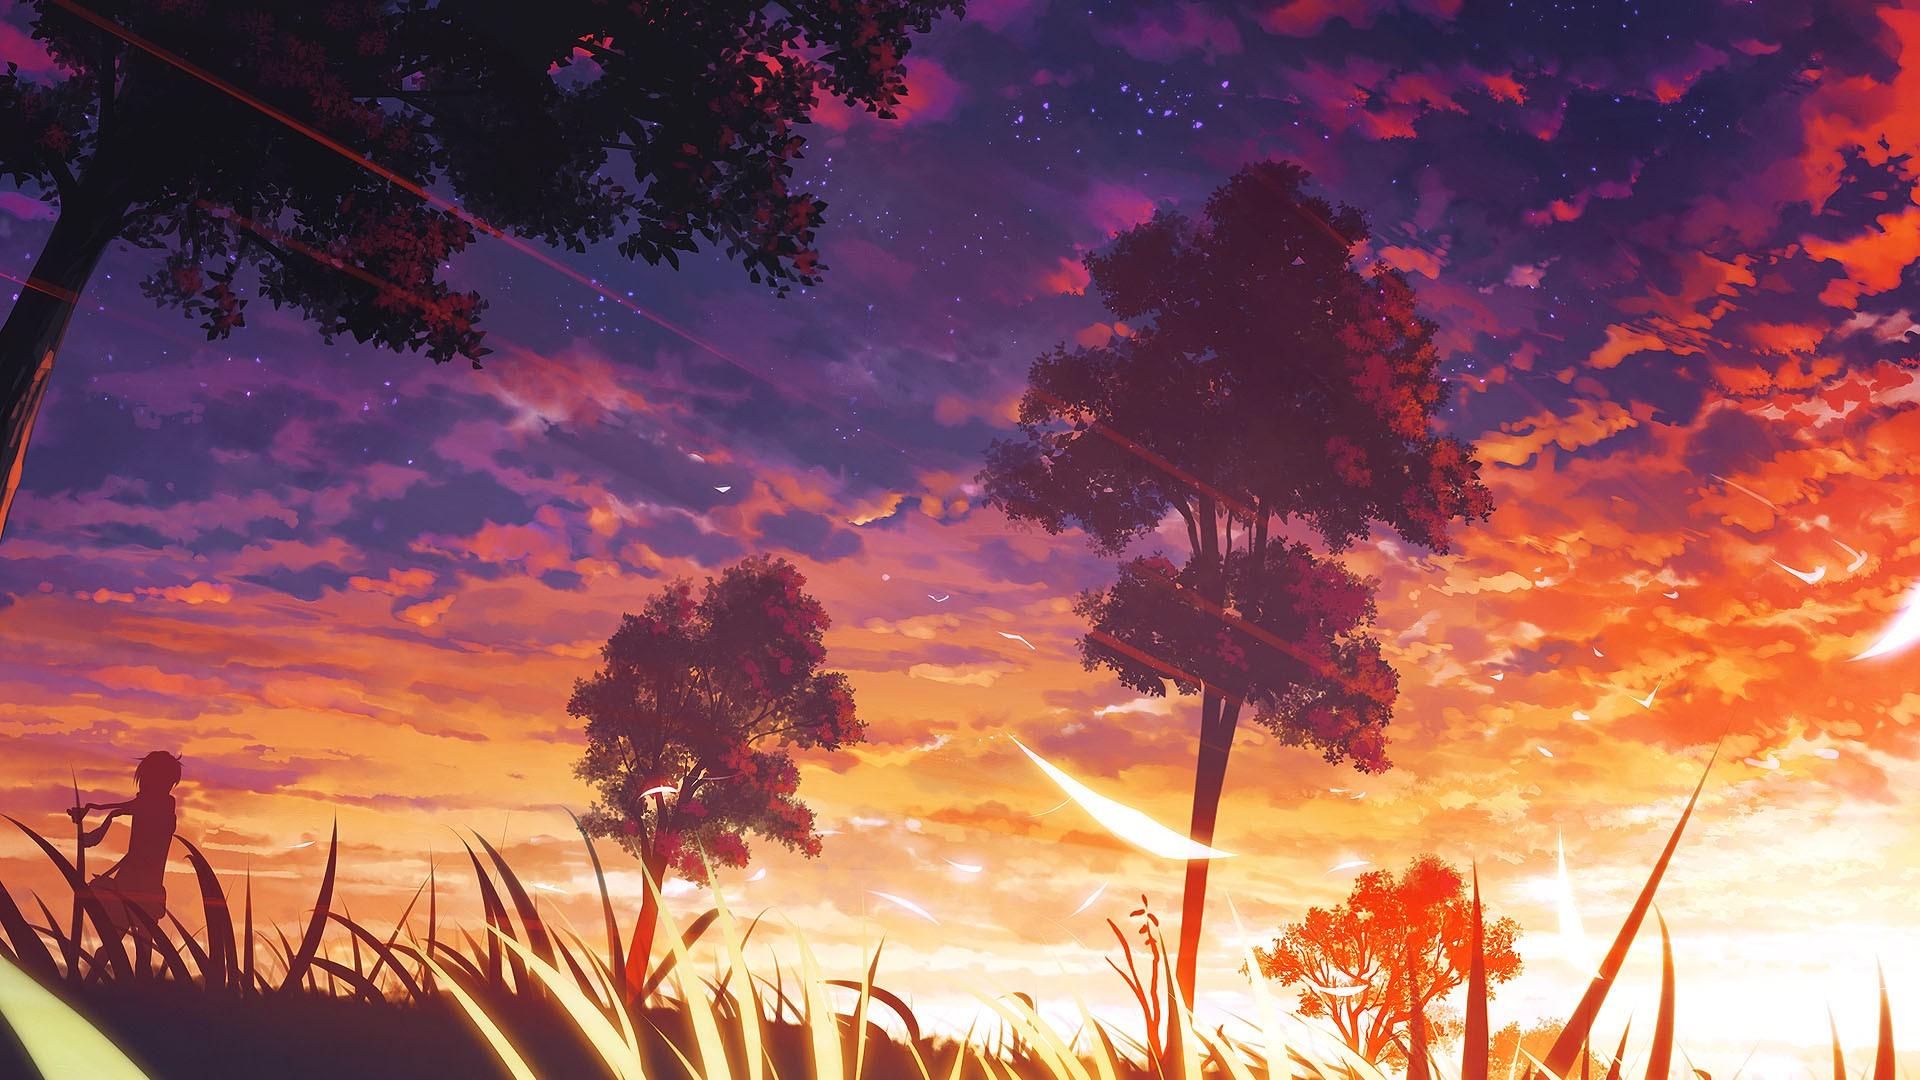 Trees, Anime, Manga, Forest Wallpapers Hd / Desktop - Purple And Orange Landscape , HD Wallpaper & Backgrounds